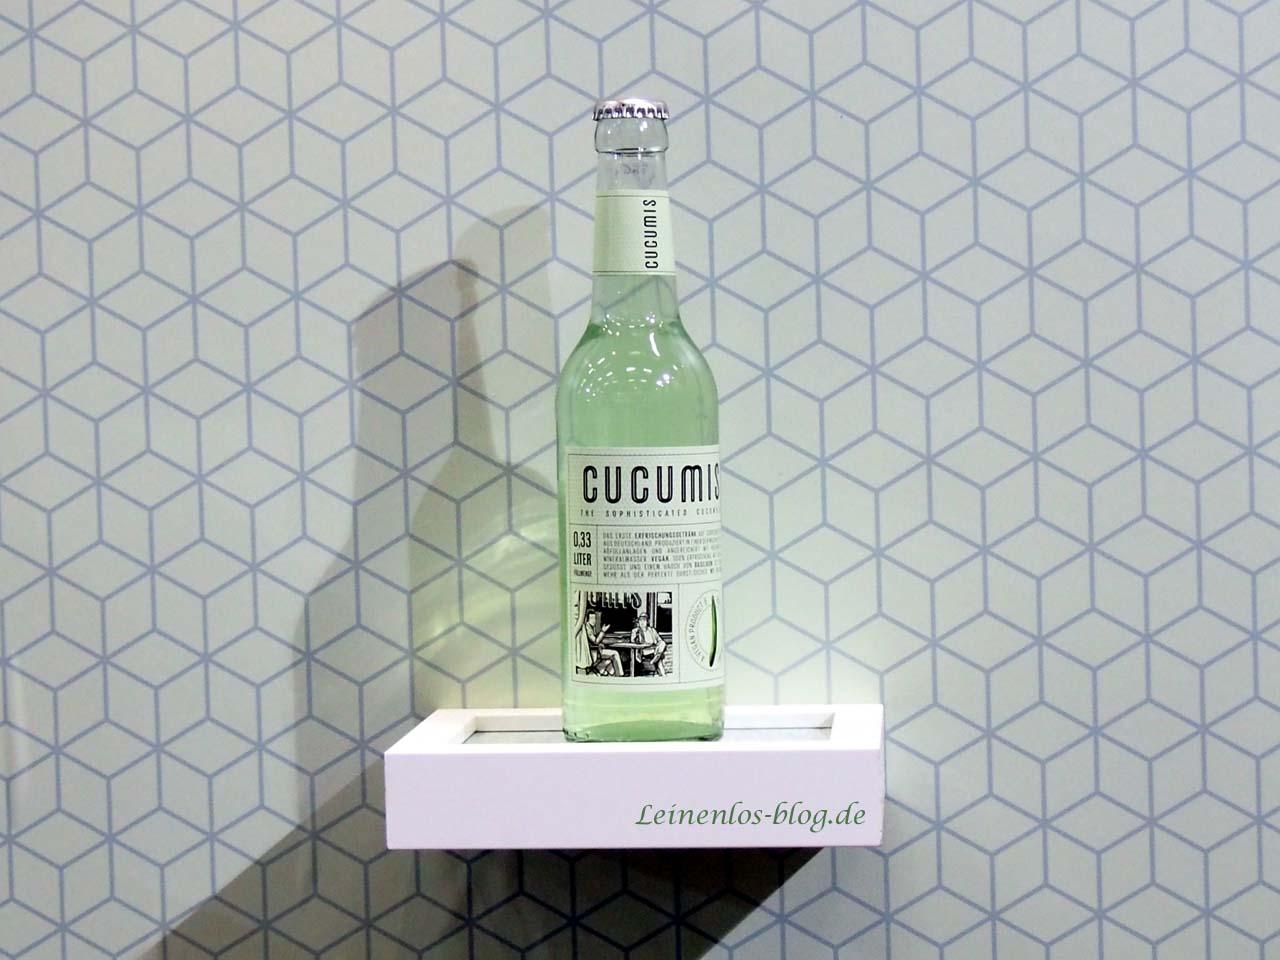 Getränke-Innovation aus Hamburg: Cucumis - Limonade auf Gurkenbasis